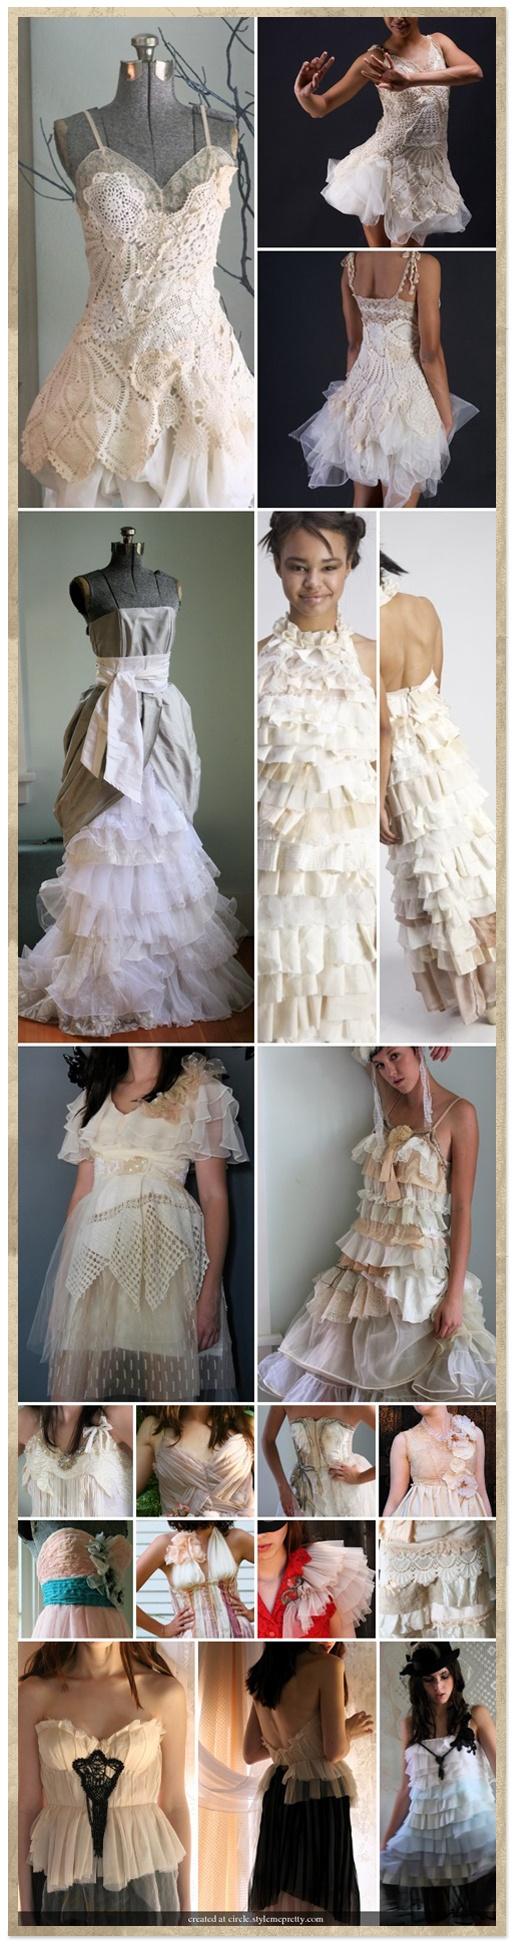 The Upcycled Wedding Dress!